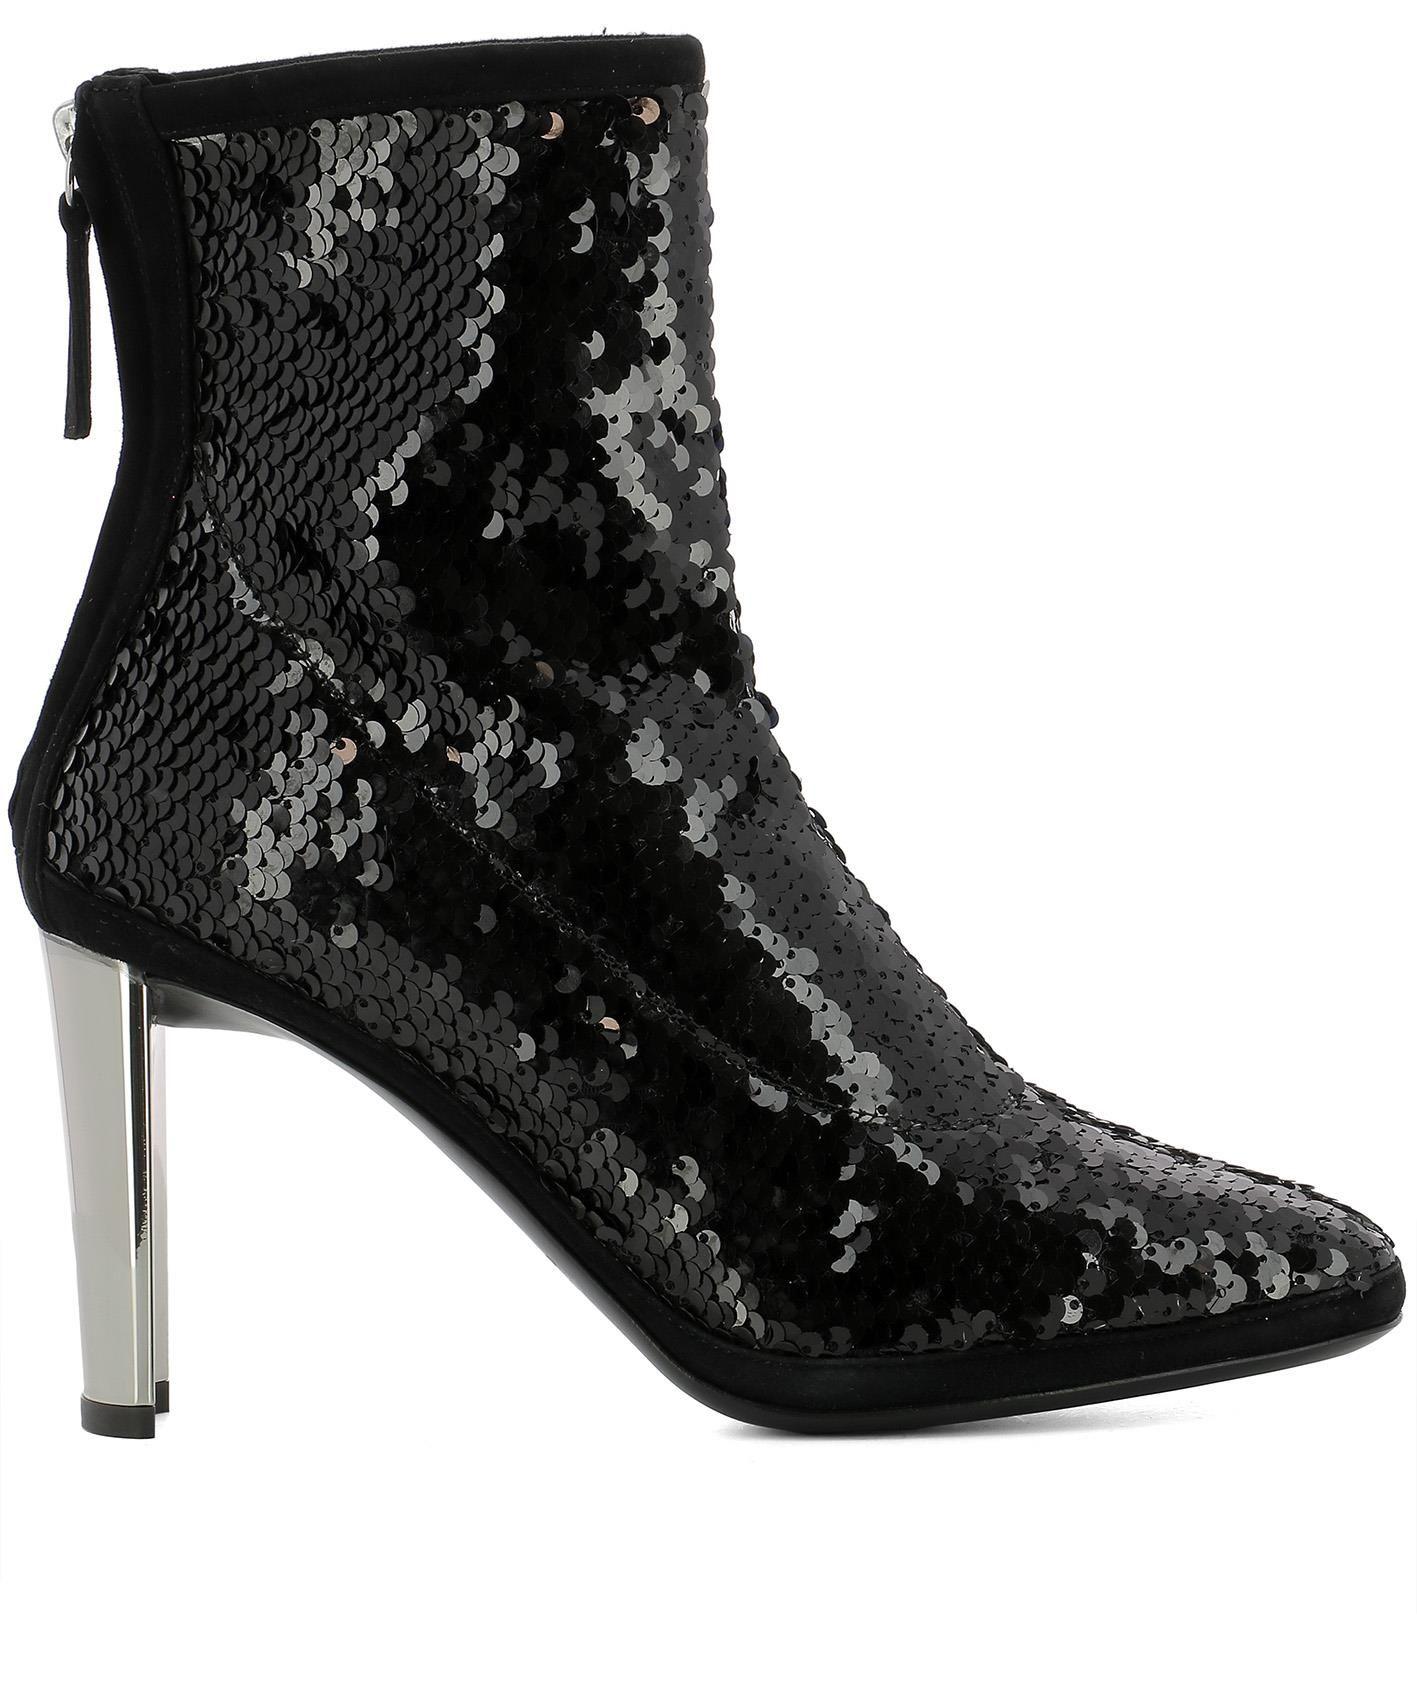 d6f53996160bb GIUSEPPE ZANOTTI GIUSEPPE ZANOTTI DESIGN WOMEN'S BLACK LEATHER ANKLE BOOTS.  #giuseppezanotti #shoes